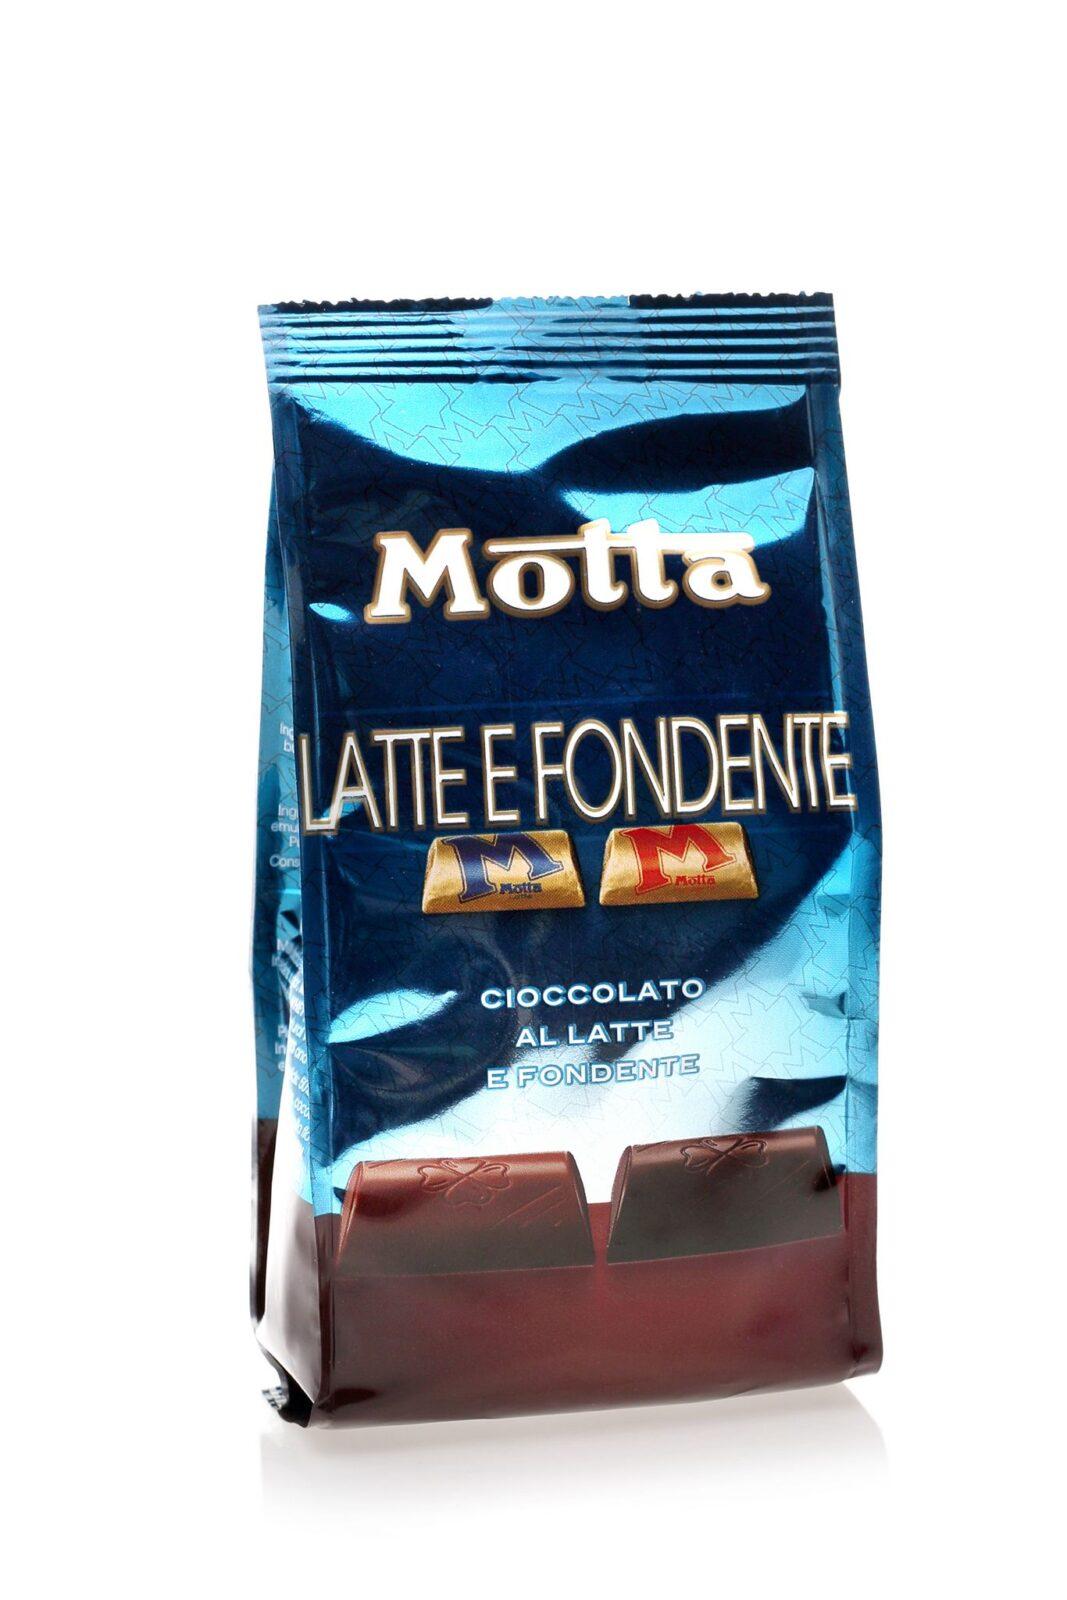 Motta Latte Fondente